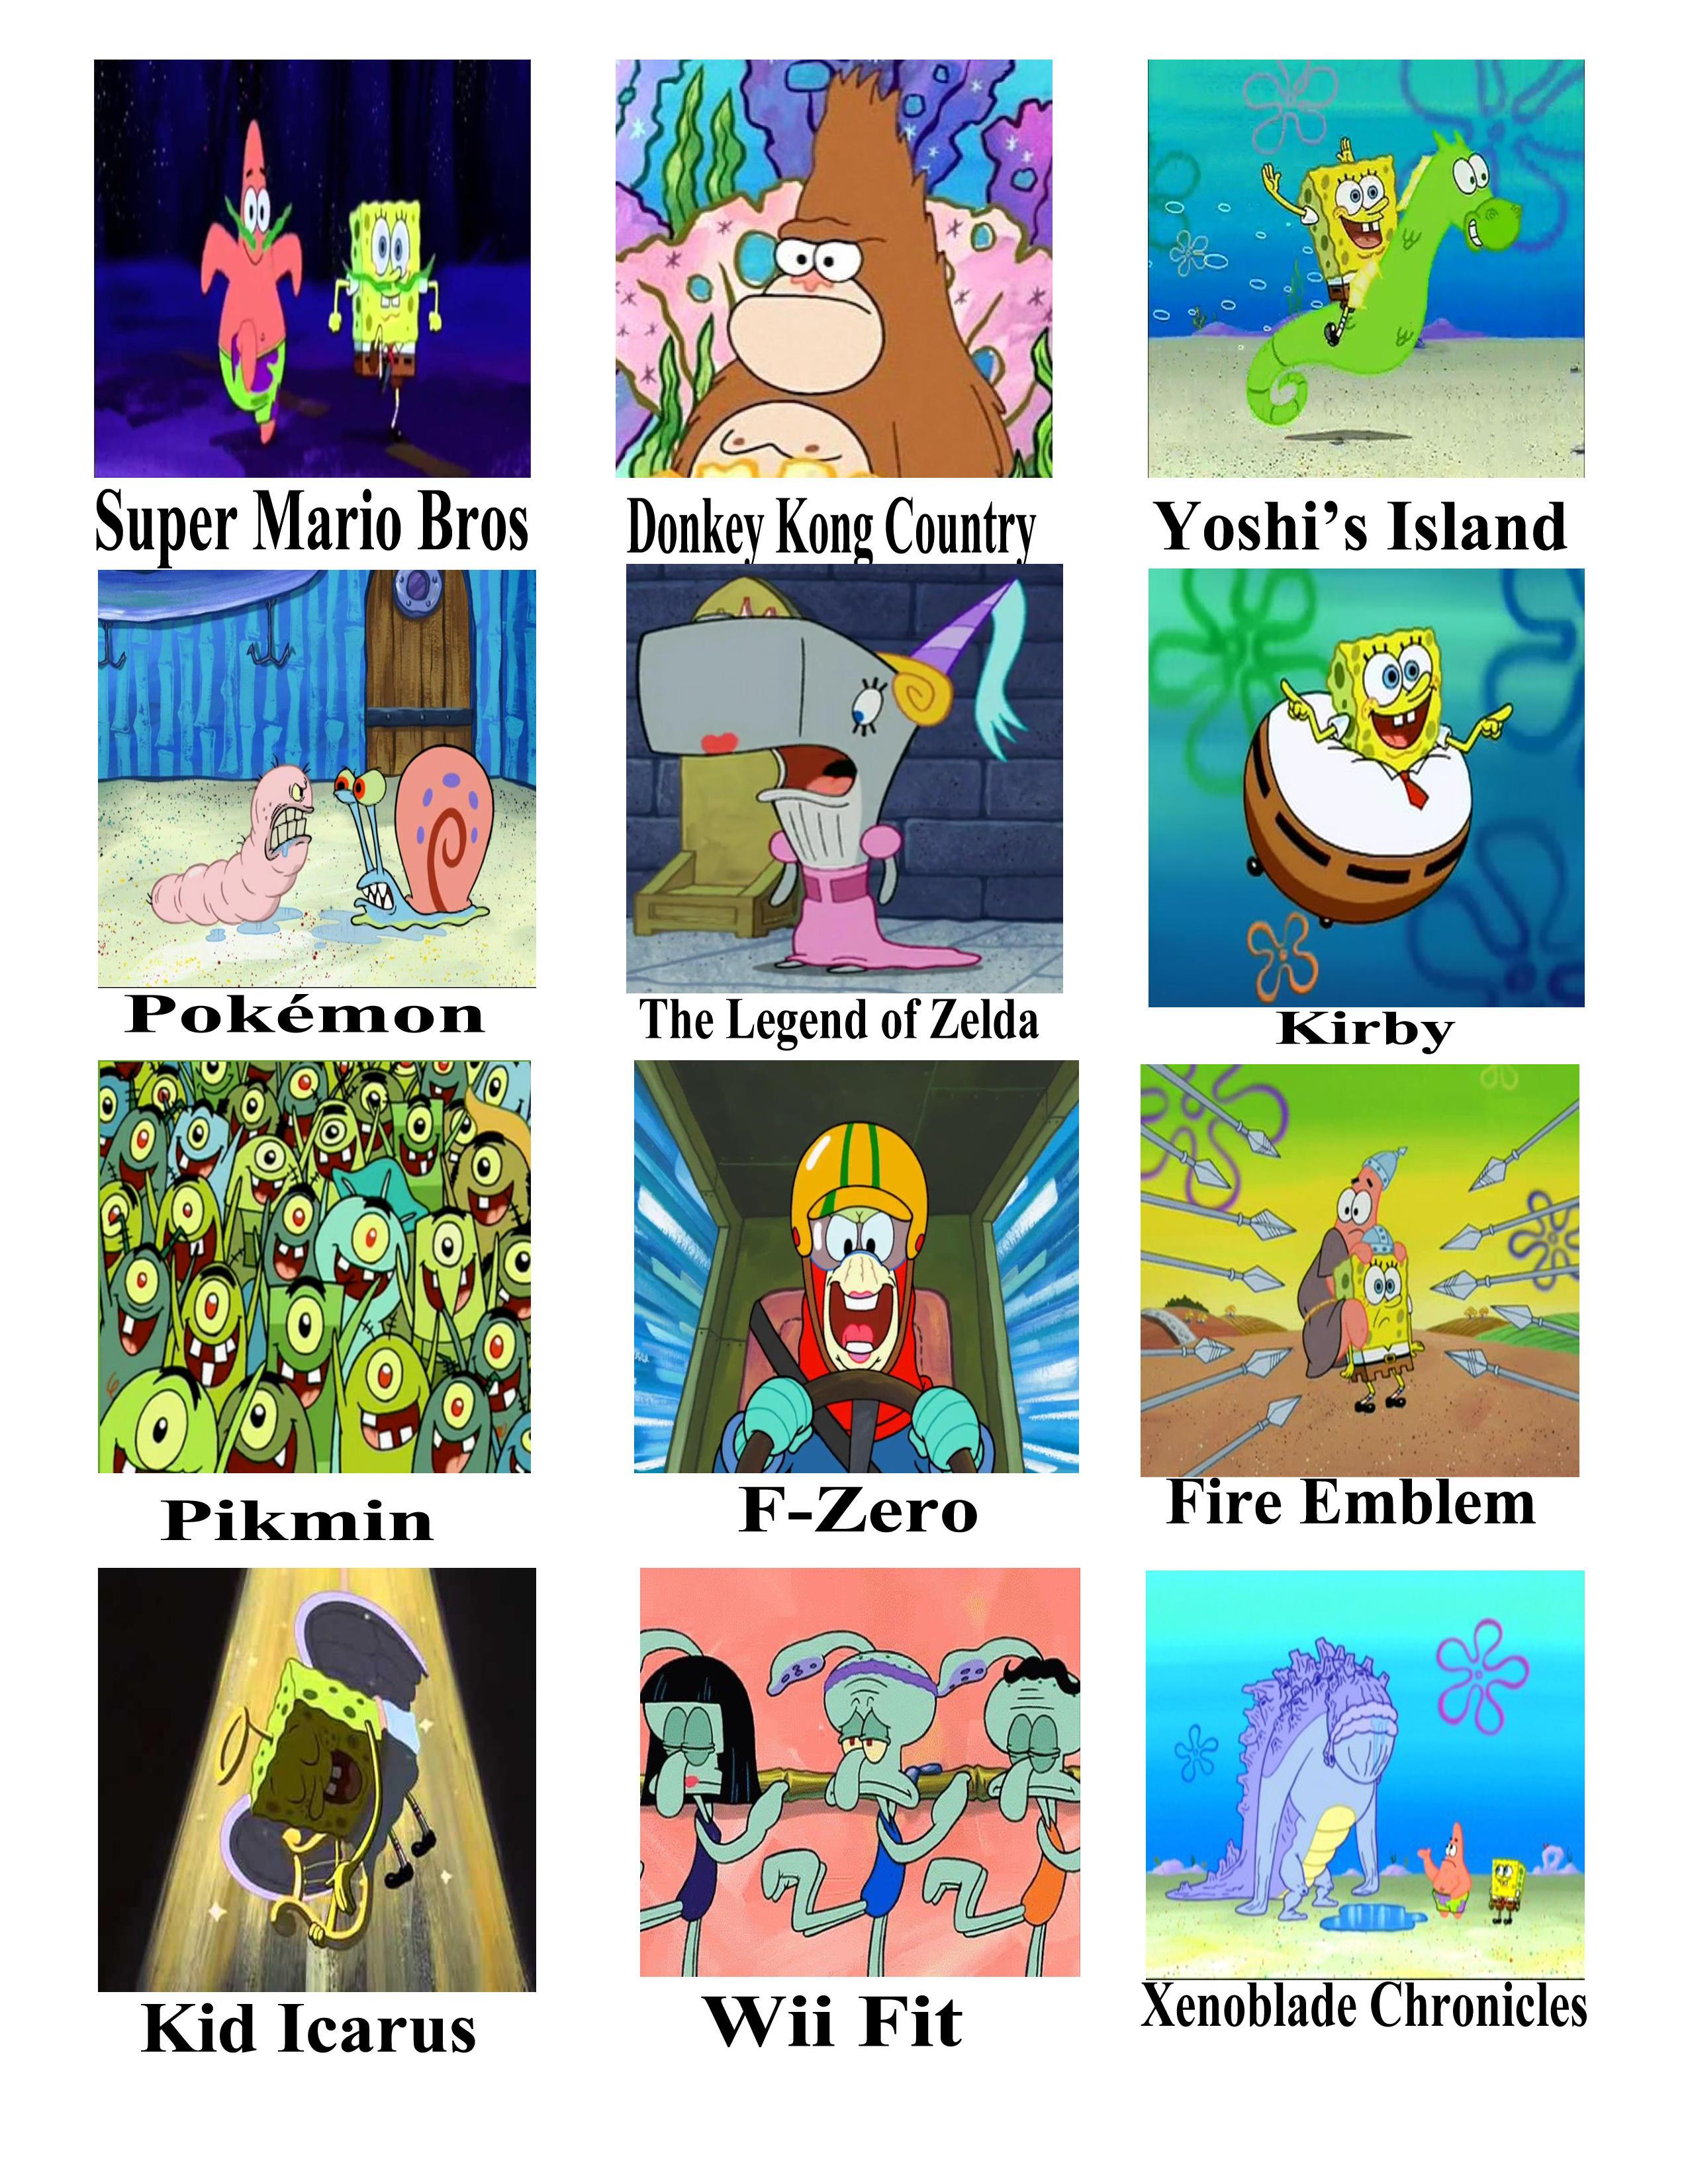 Spongebob As Nintendo Franchises Spongebob Comparison Charts